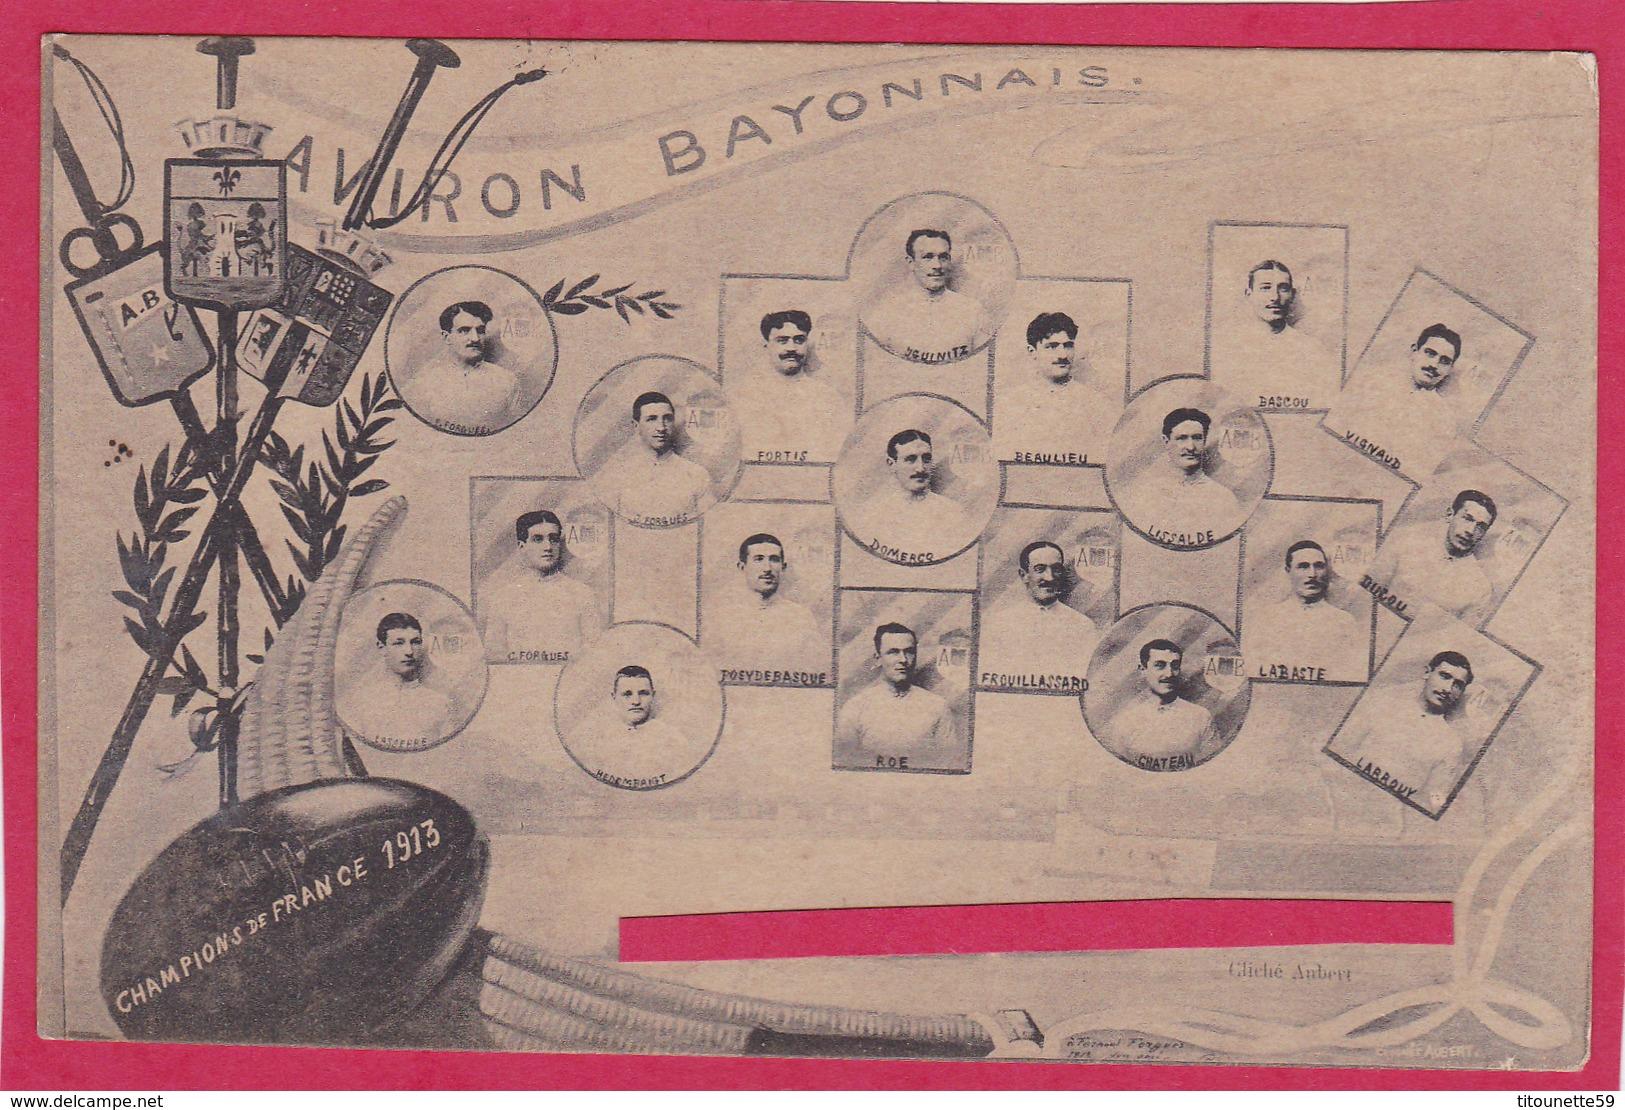 64-AVIRON BAYONNAIS - CHAMPIONS De FRANCE 1913 (Nommés Sous Chaque Photo)-SPORT- AVIRON- - Aviron